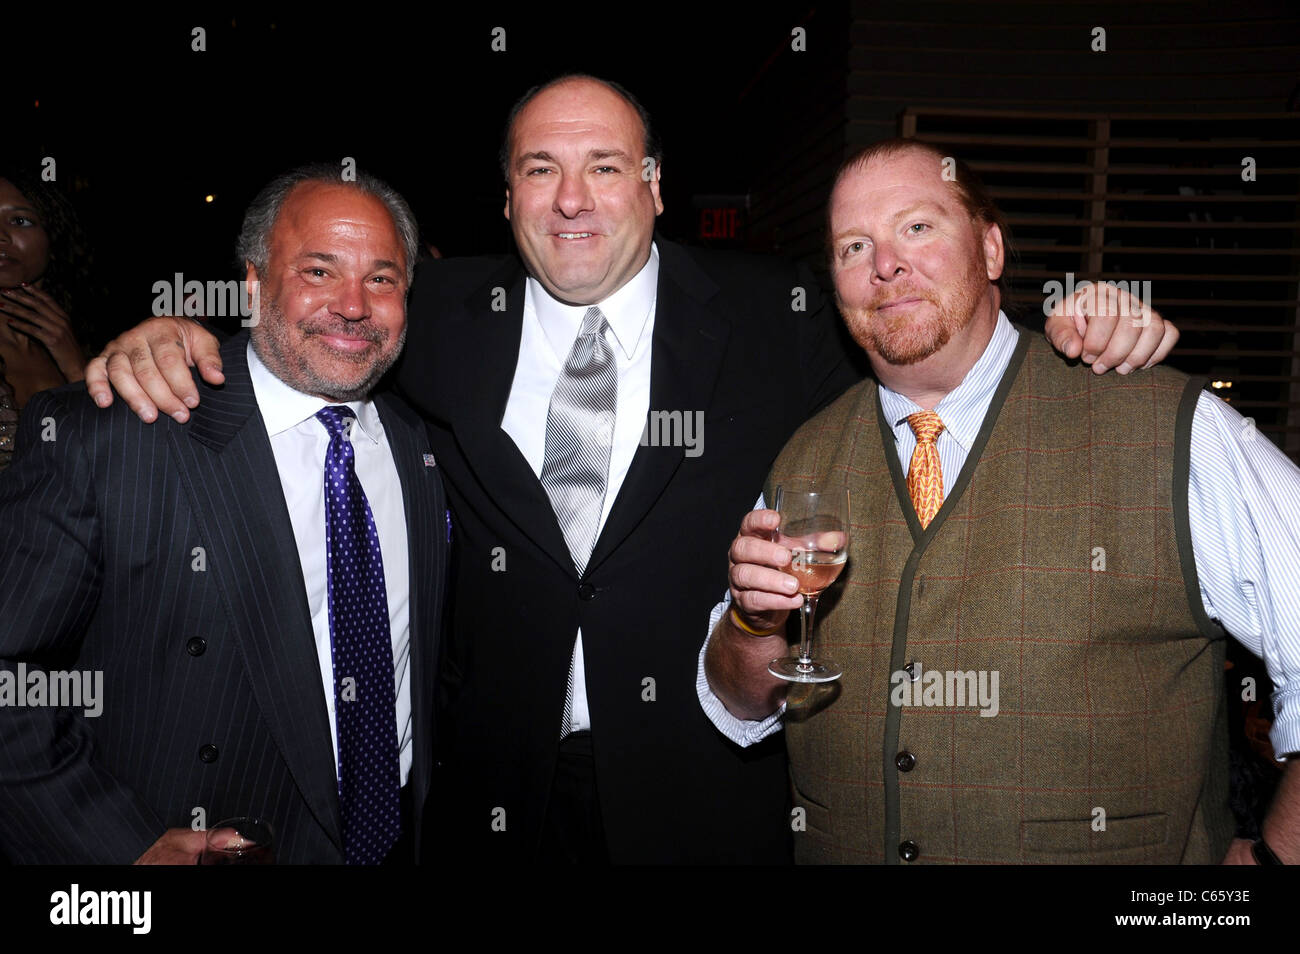 Bo Dietl, James Gandolfini, Mario Batali in attendance for A Stock ...